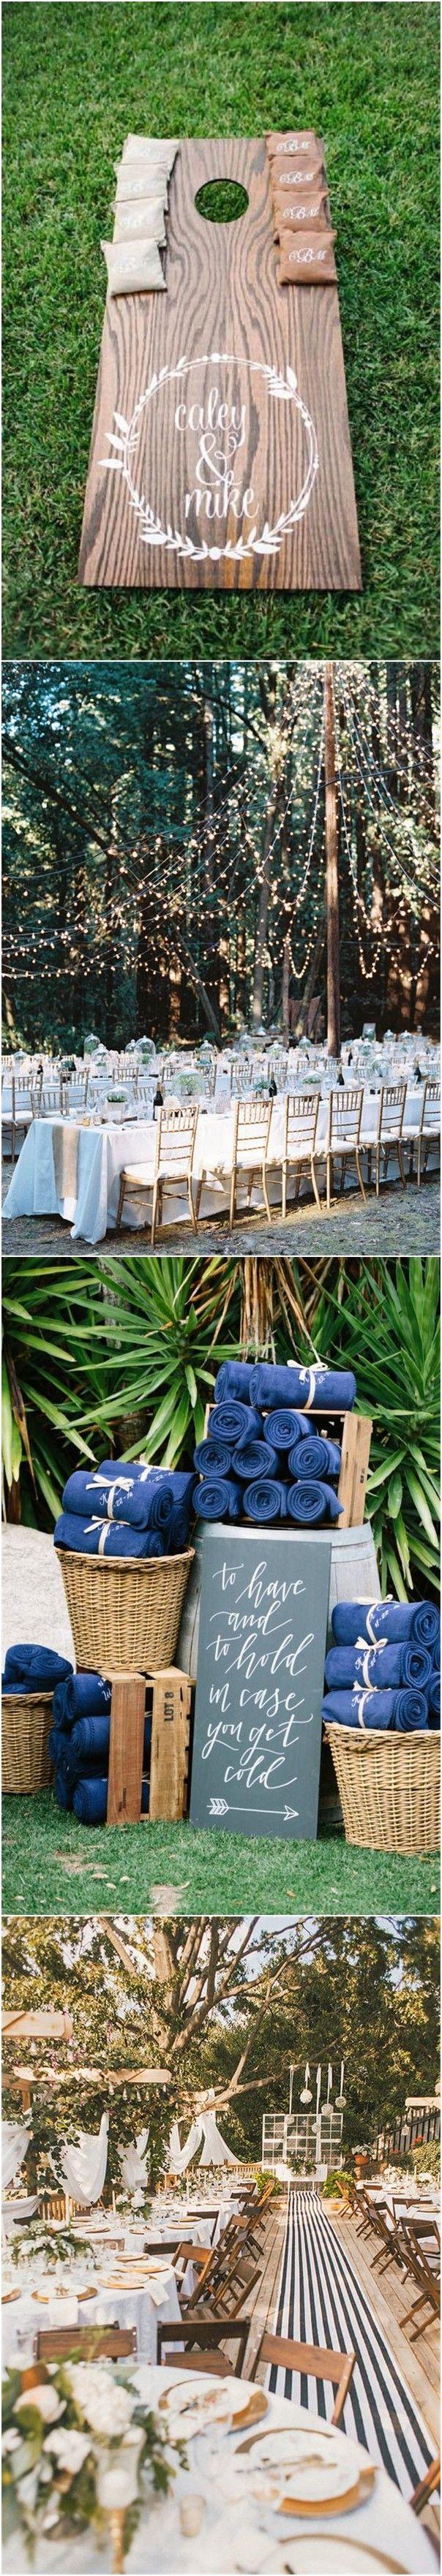 best 25 rustic backyard ideas on pinterest picnic tables